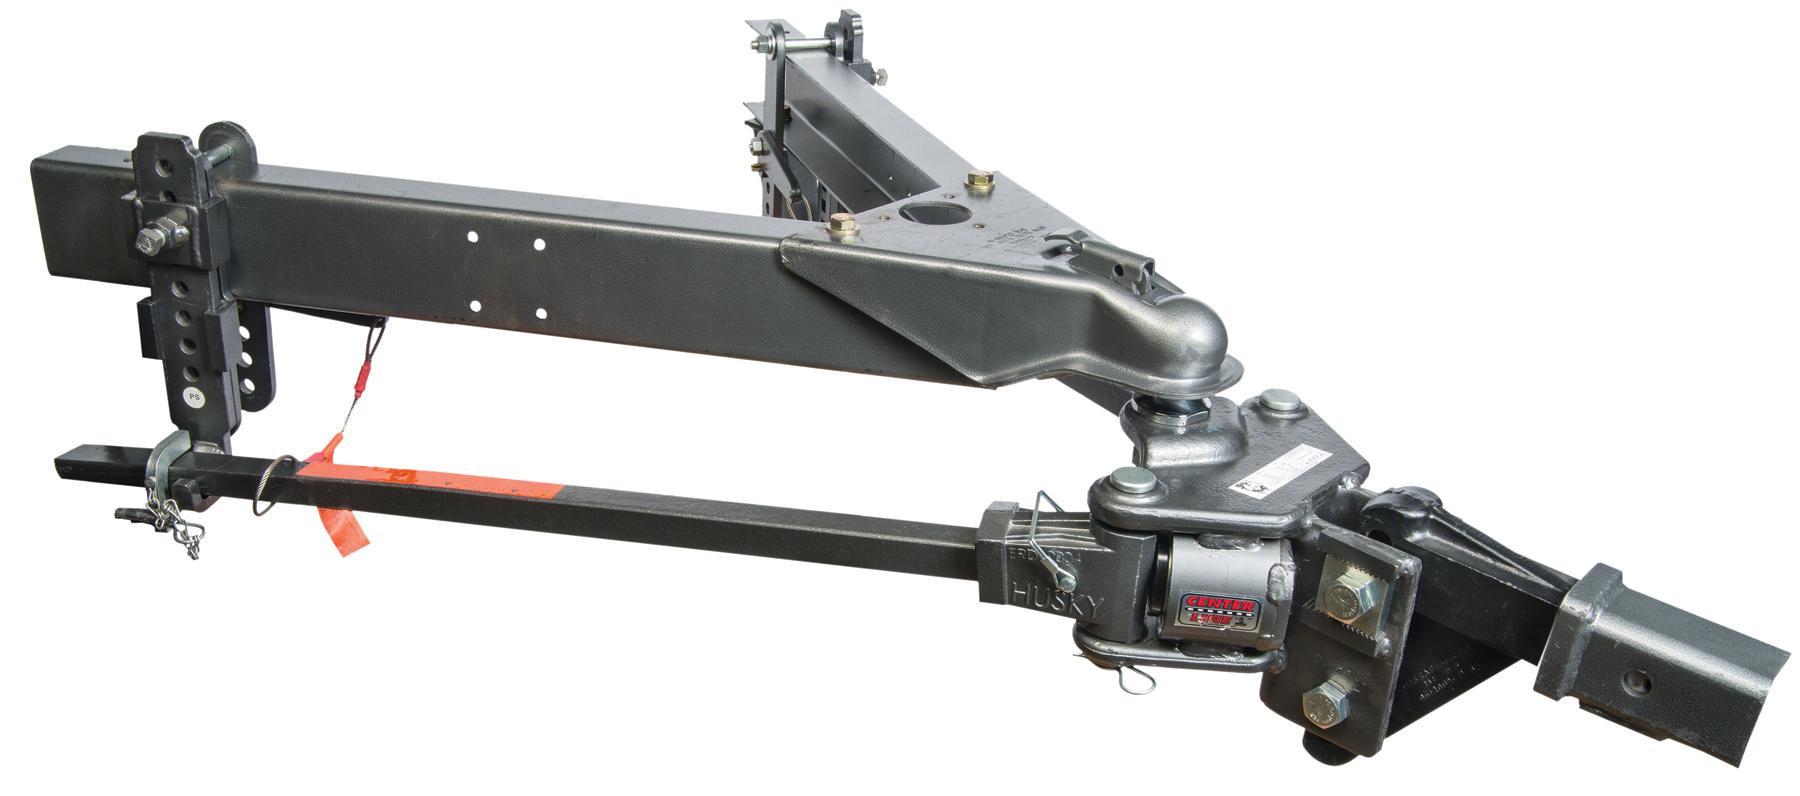 Amazon.com: Husky 31390 Center Line Head Assembly: Automotive